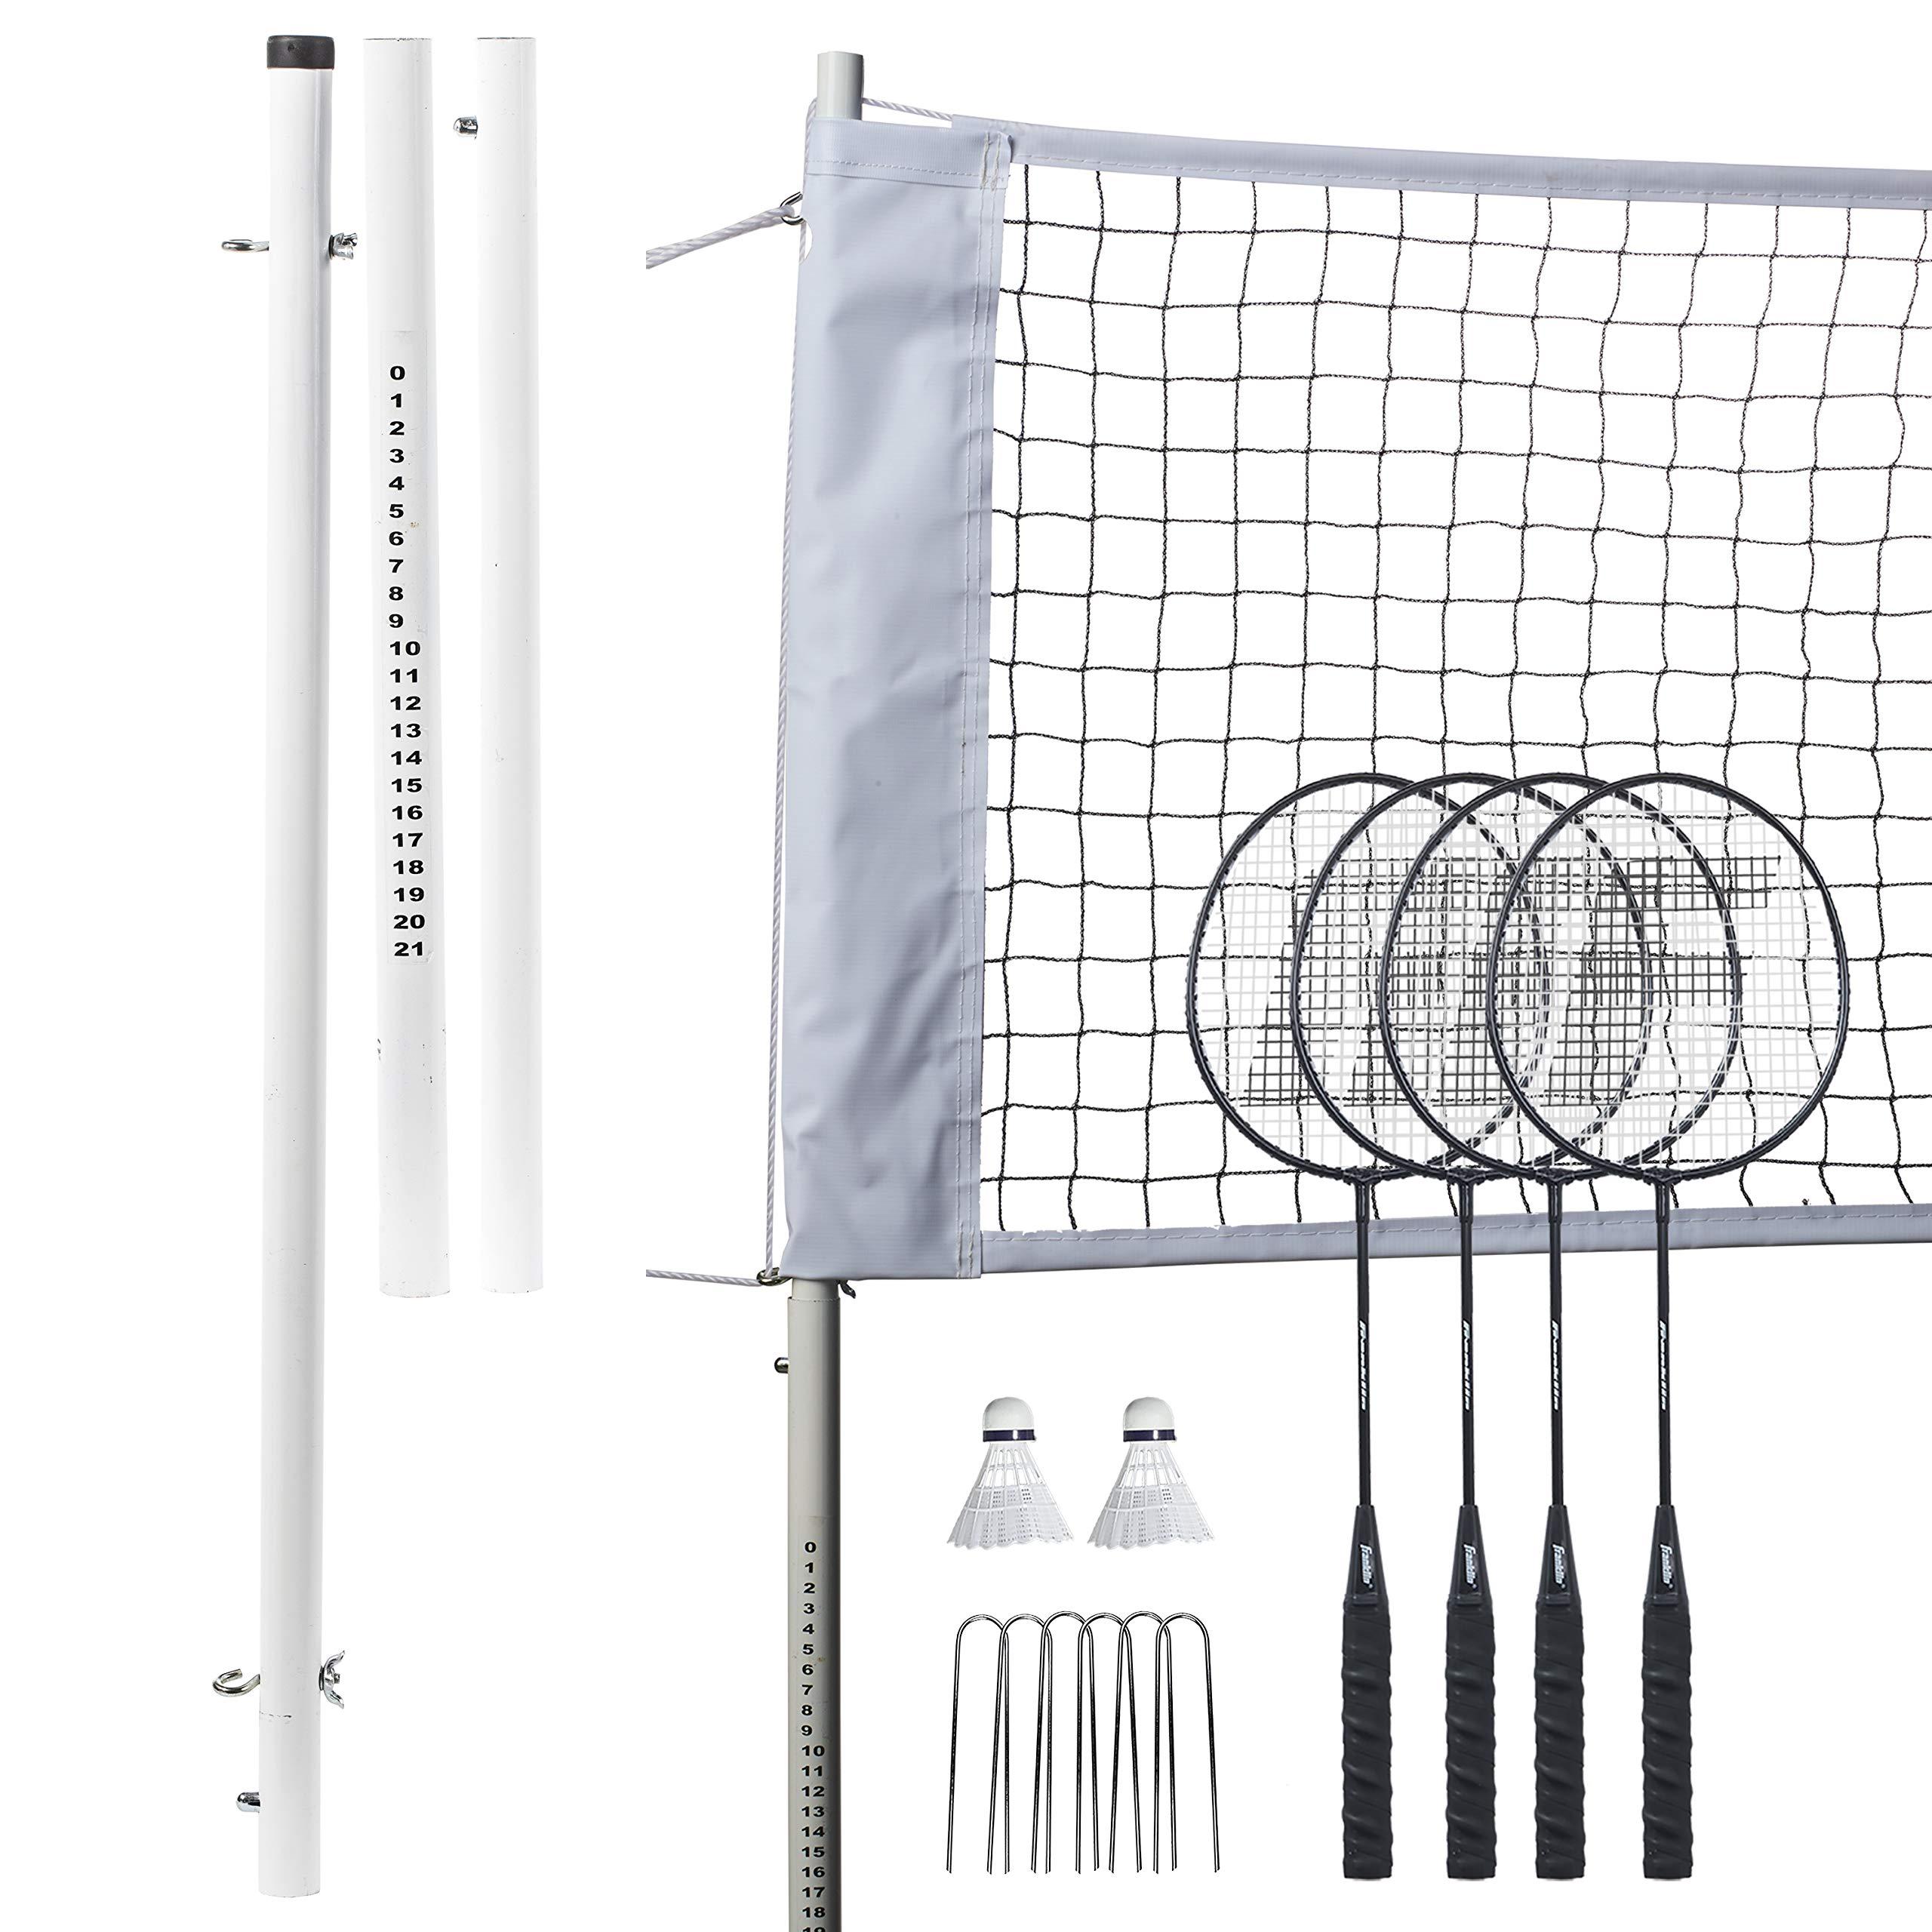 Franklin Sports Badminton Net Professional Set - 4 Aluminum Rackets, 2 Birdies, Adjustable Net and Stakes - Backyard or Beach Badminton Set - Easy Setup